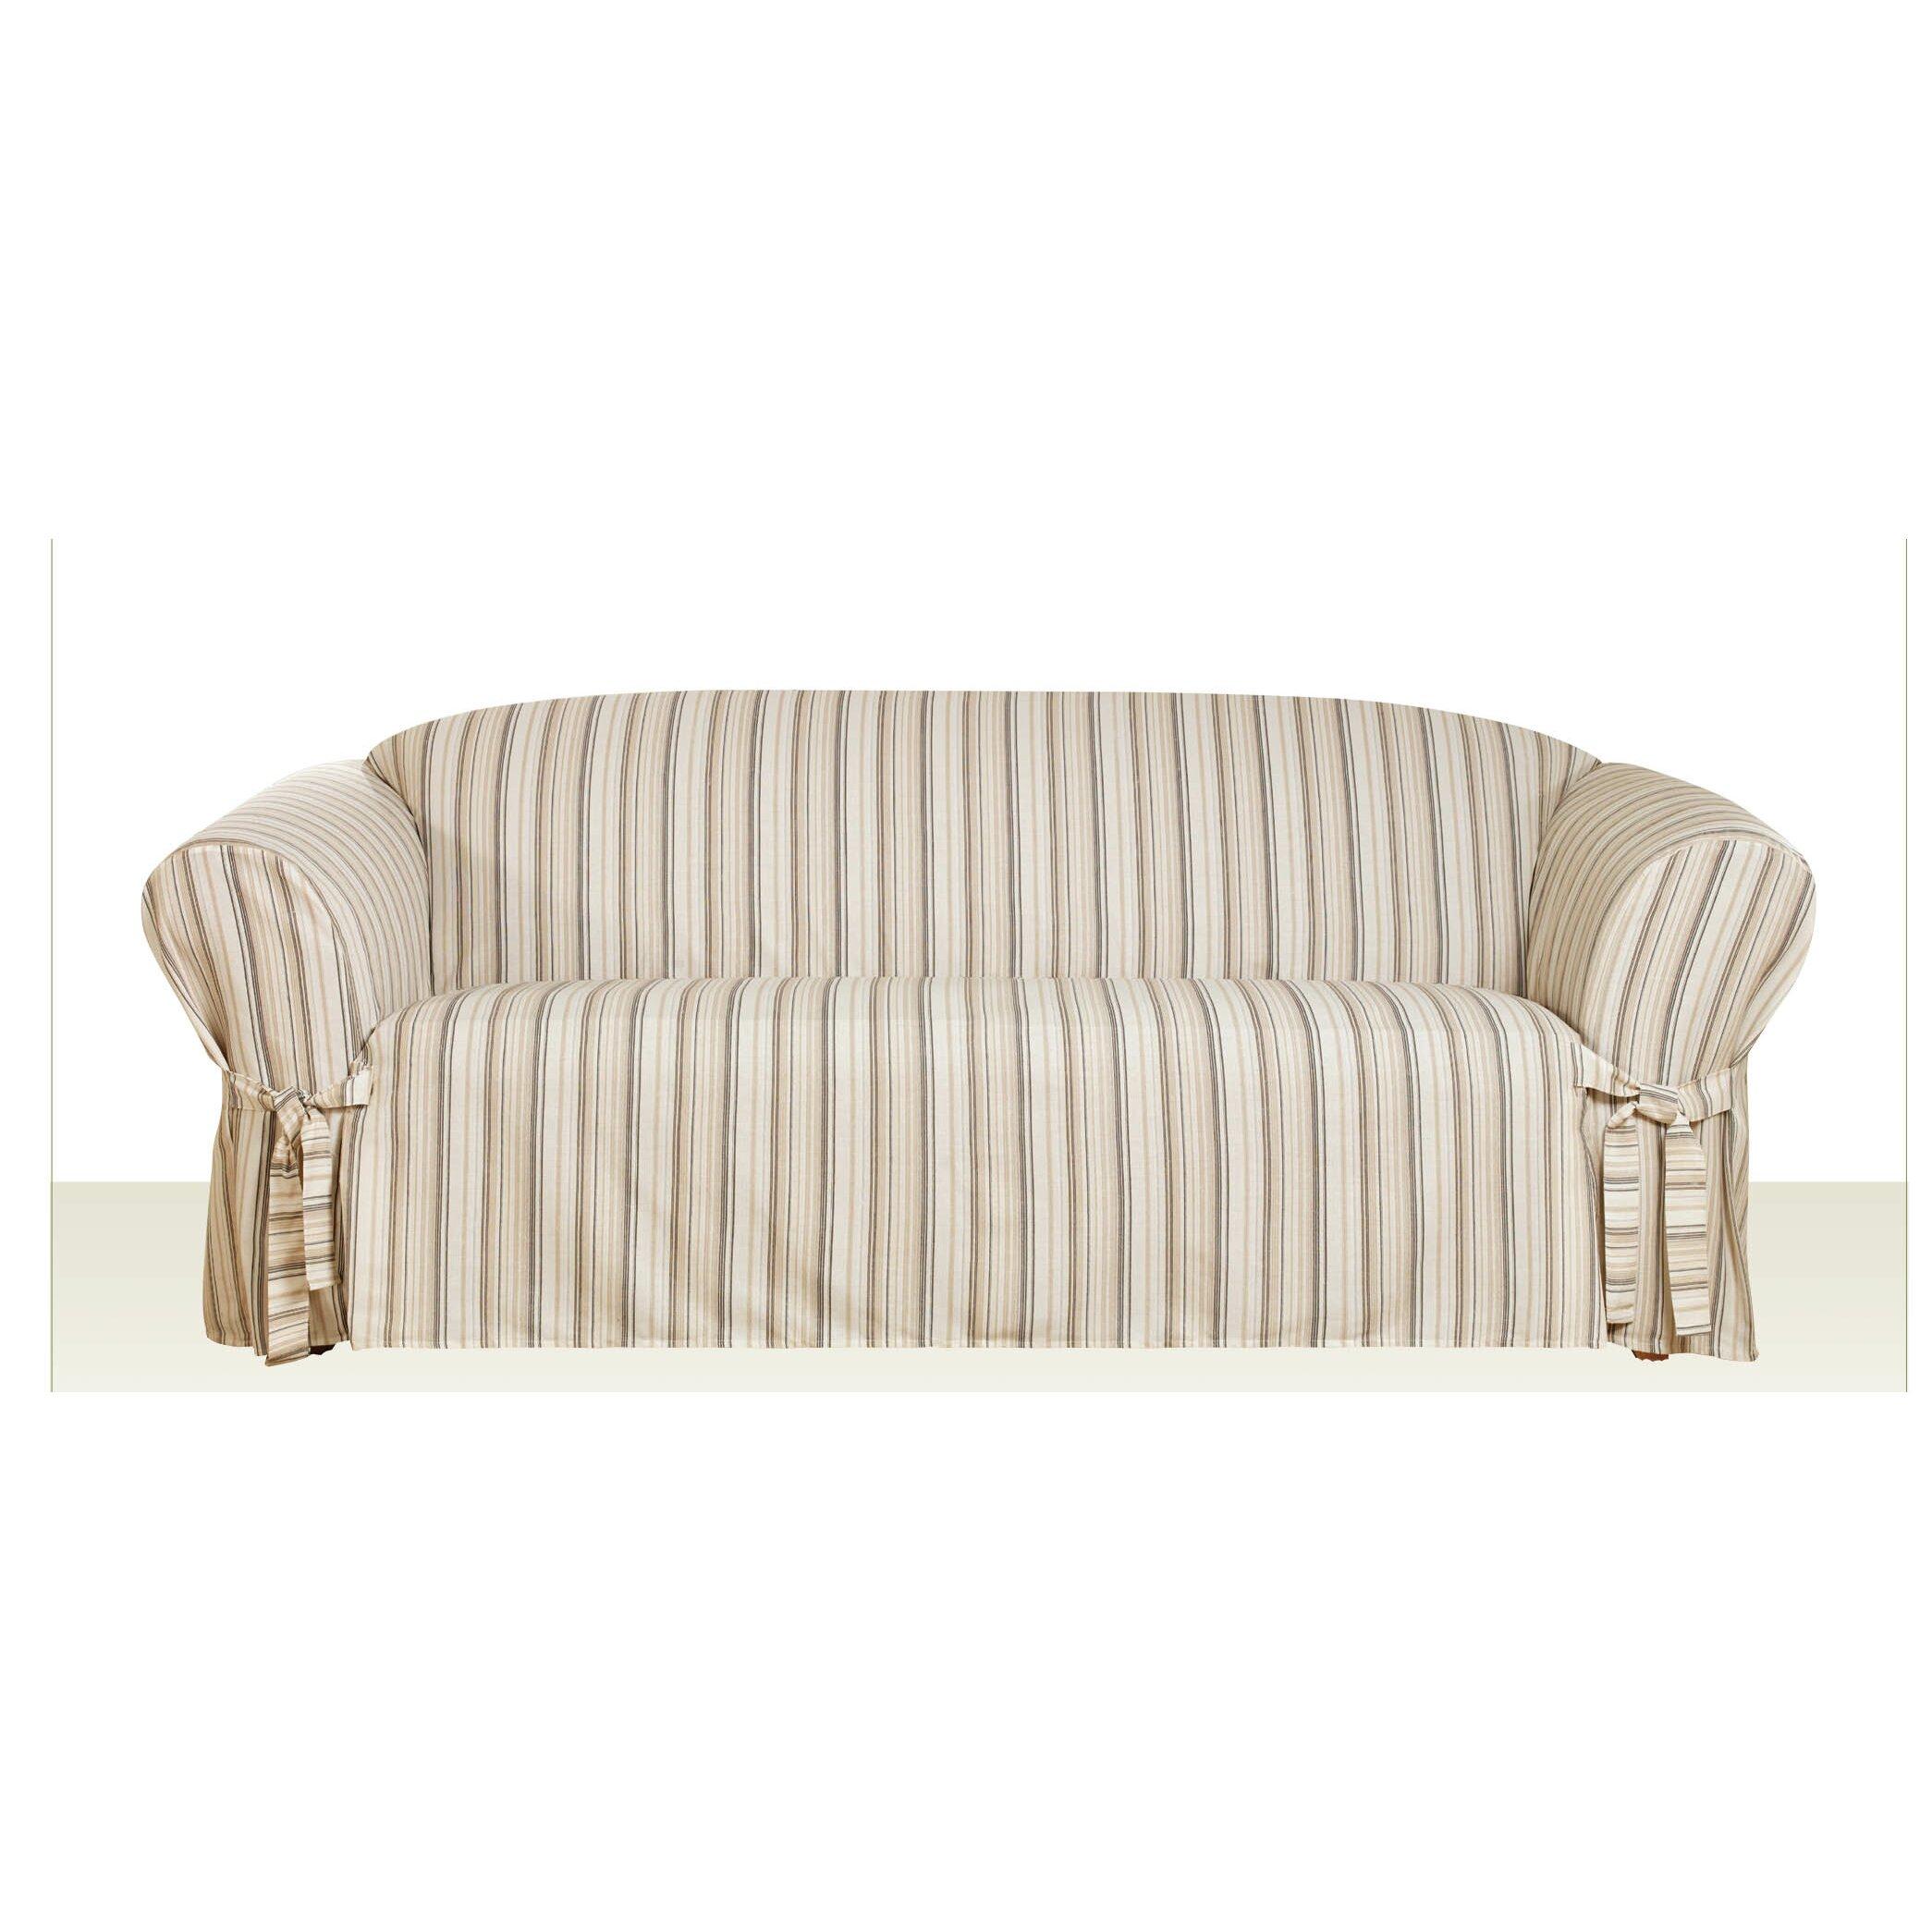 Sure Fit Seaside Sofa T-Cushion Skirted Slipcover